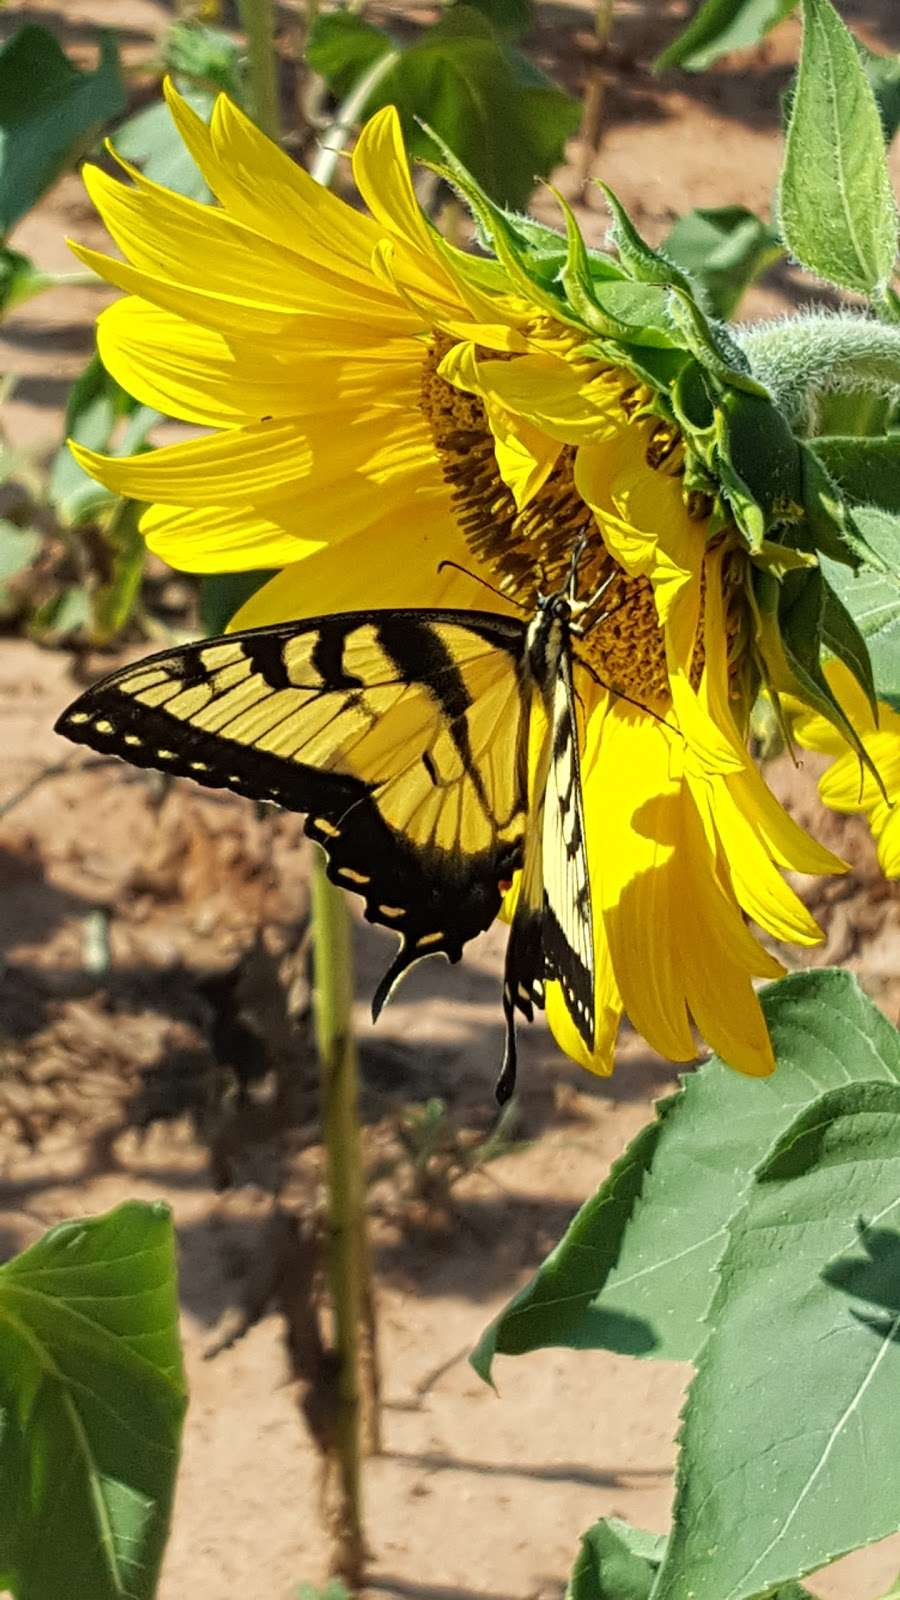 Draper Wildlife Management Area - park  | Photo 2 of 5 | Address: 1080 Brattonsville Rd, McConnells, SC 29726, USA